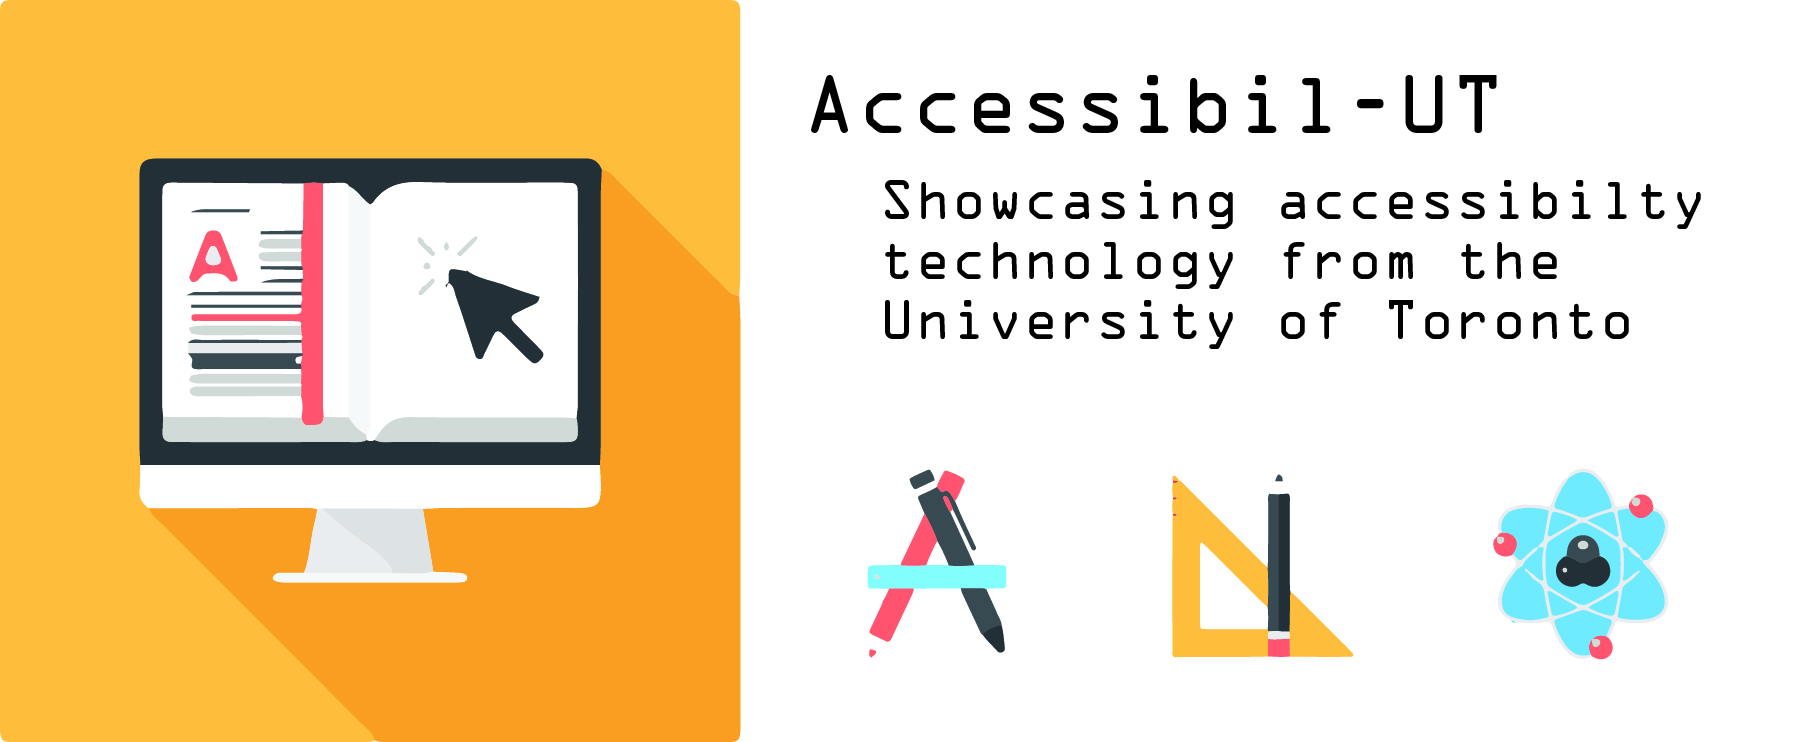 accessibil-ut banner heading